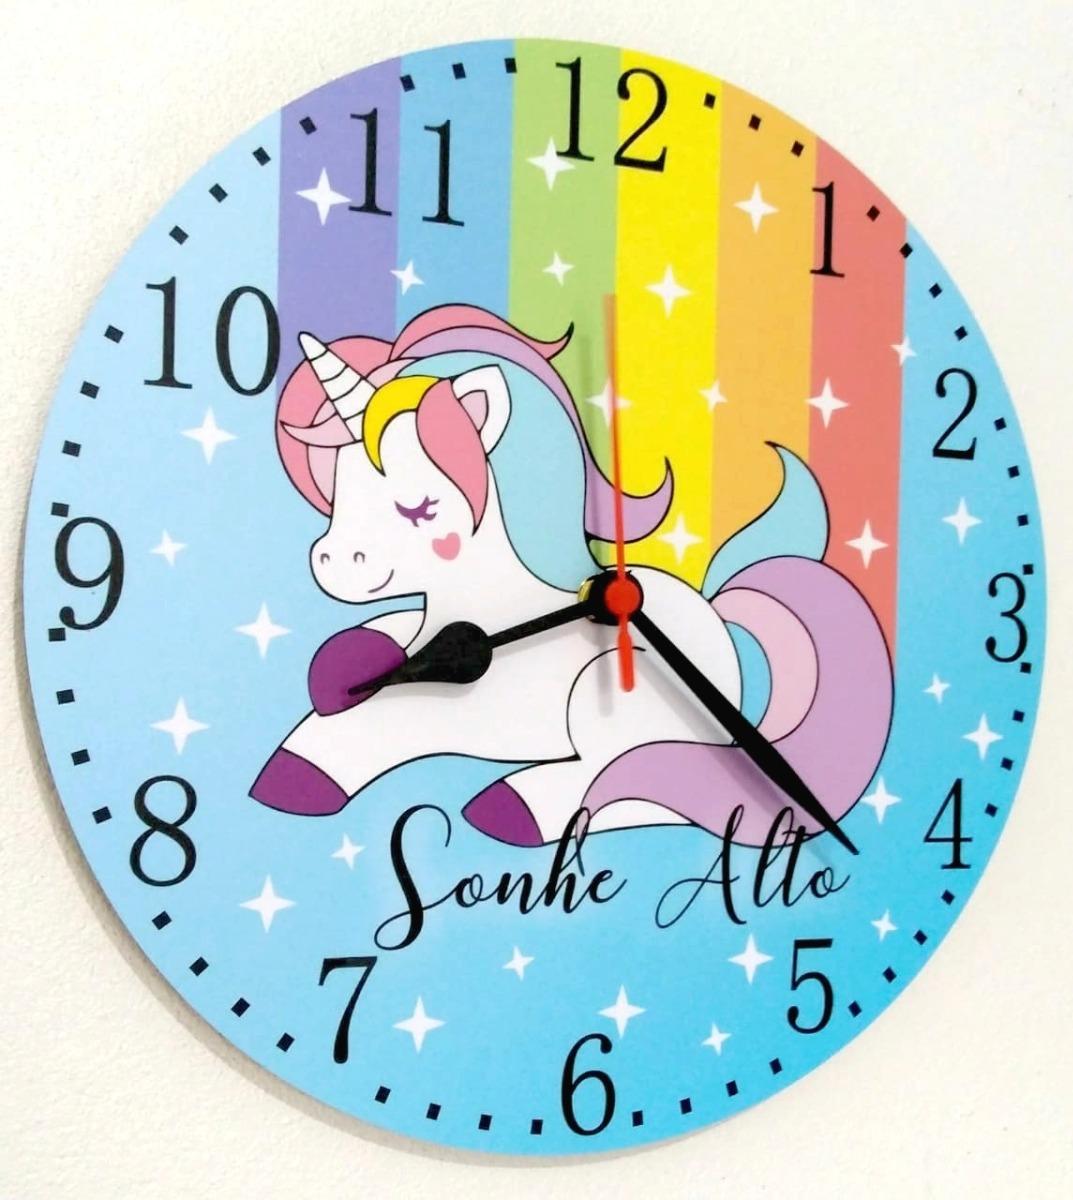 Relogio Parede Unicornio Infantil Crianca Sonhe Alto Menina Arco